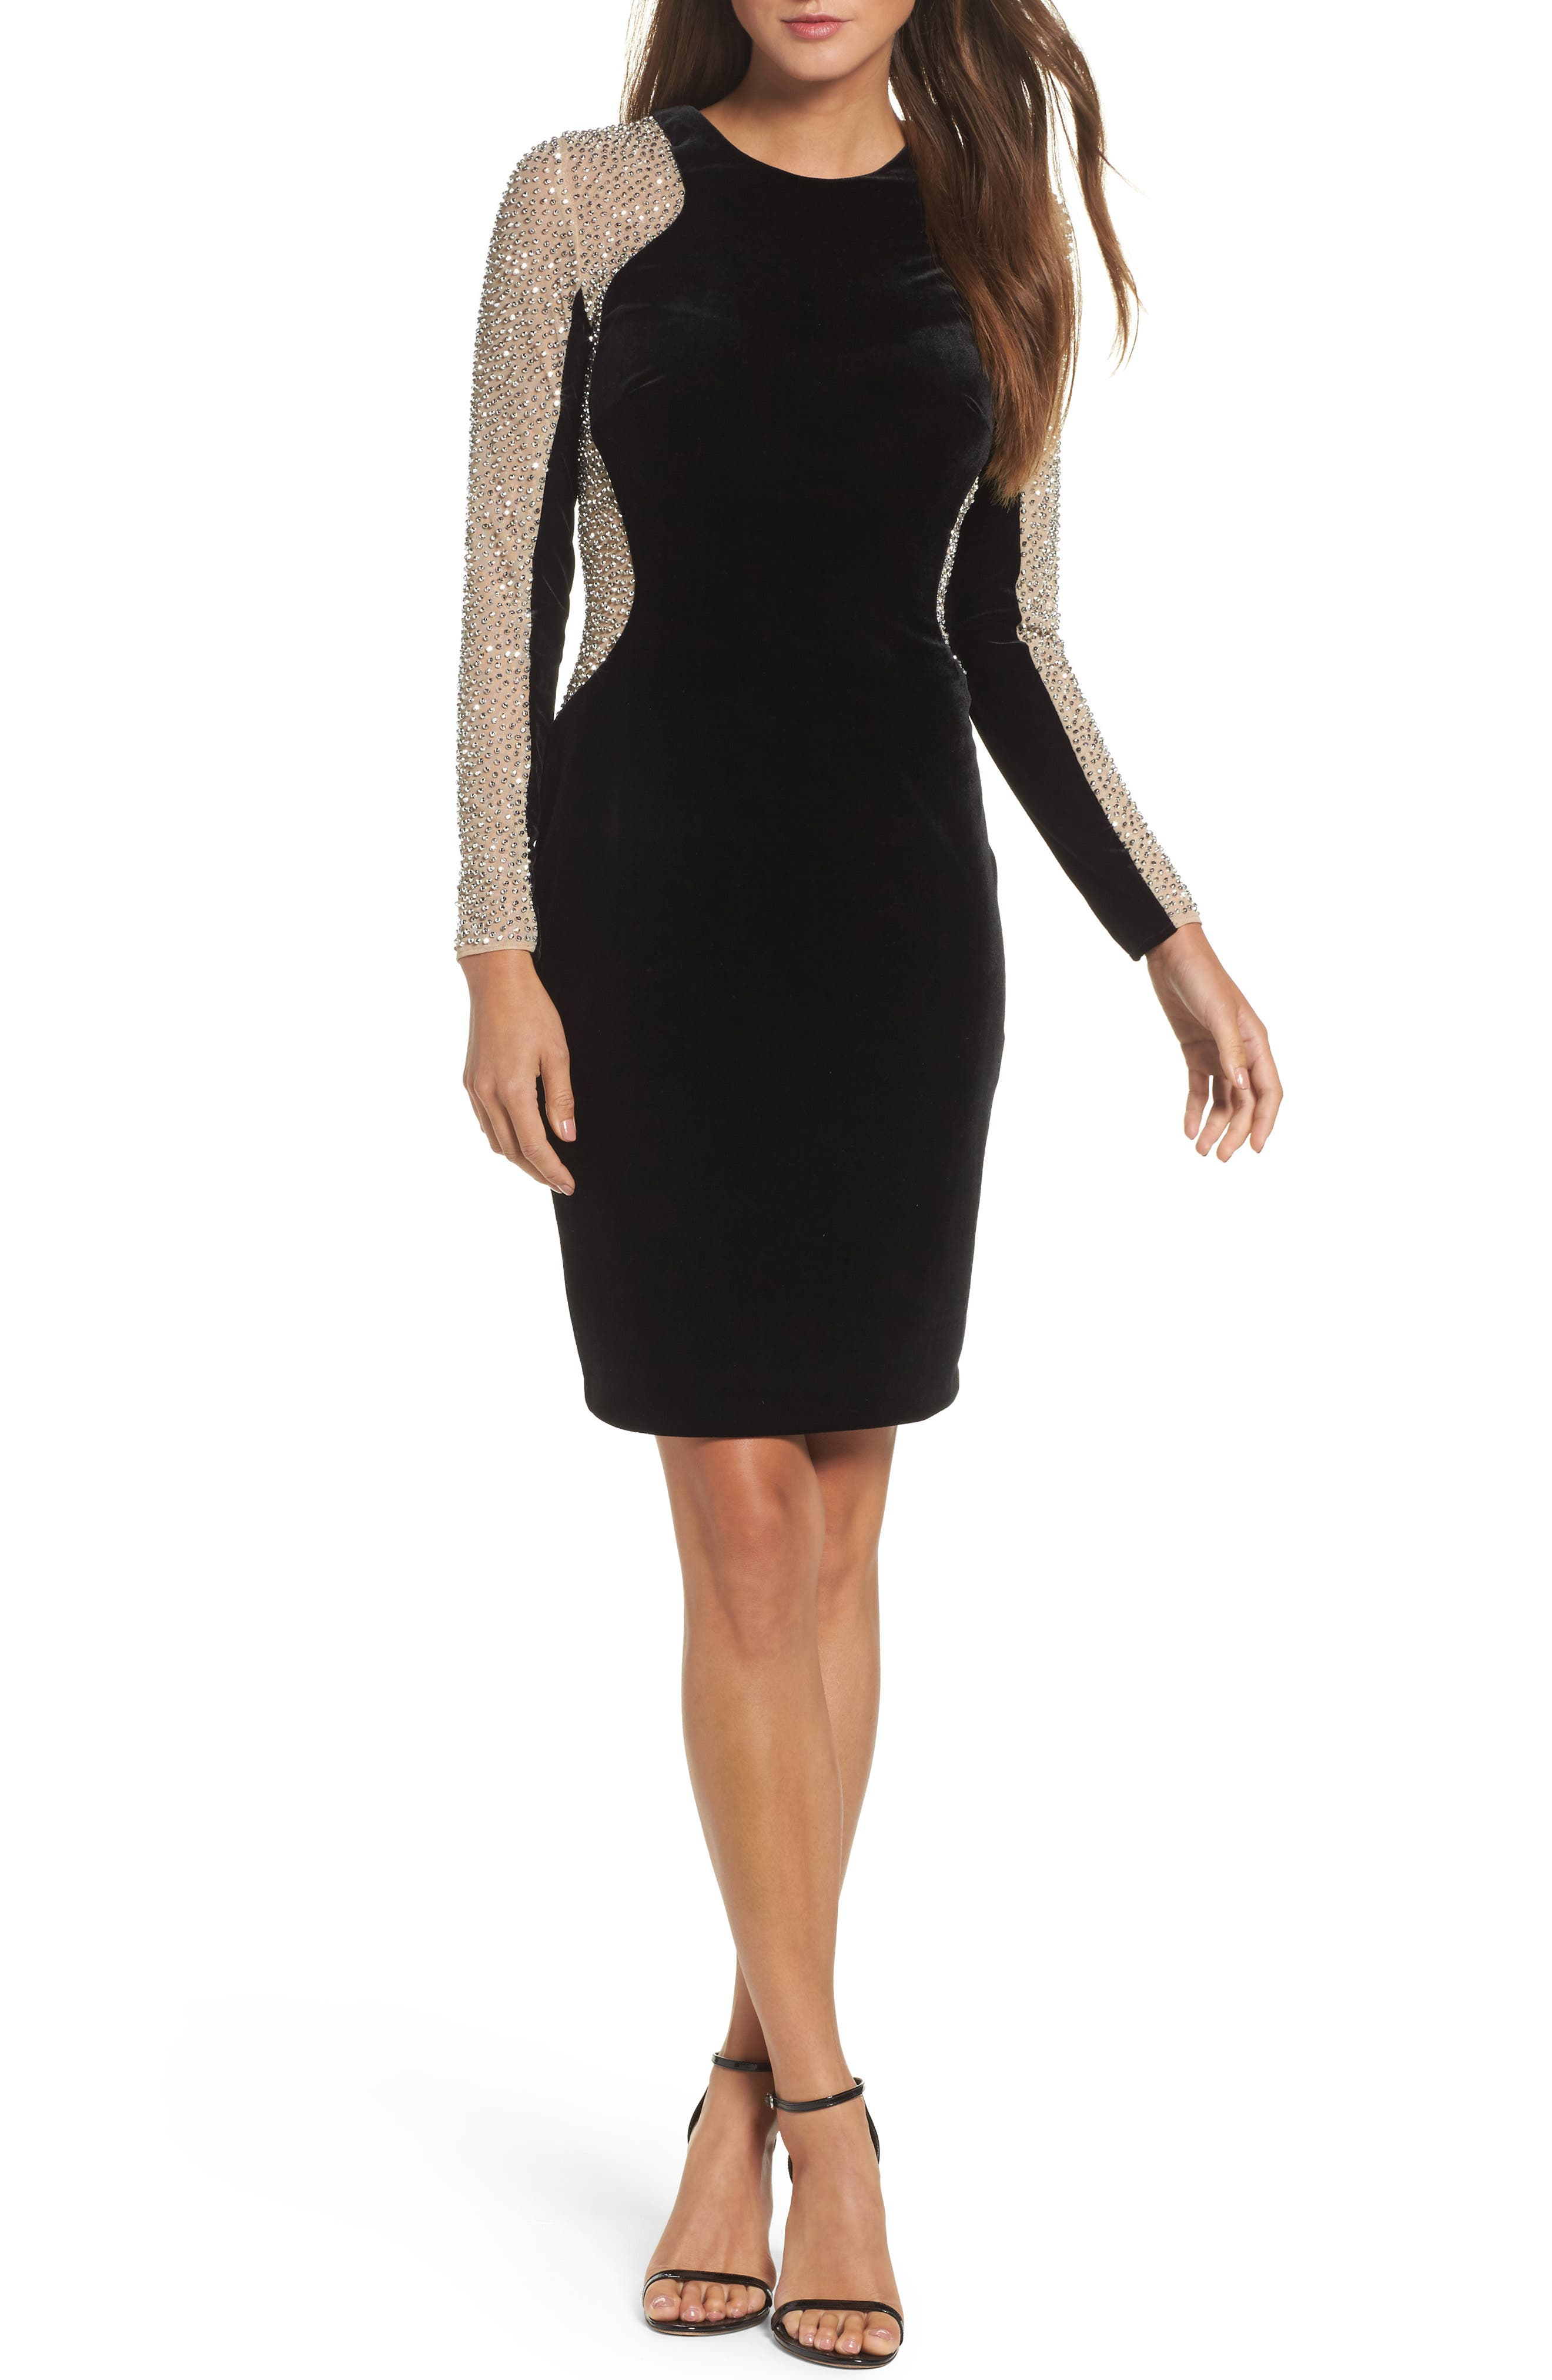 Caviar Bead Mesh Velvet Body-Con Dress,                         Main,                         color, BLACK/ NUDE/ SILVER